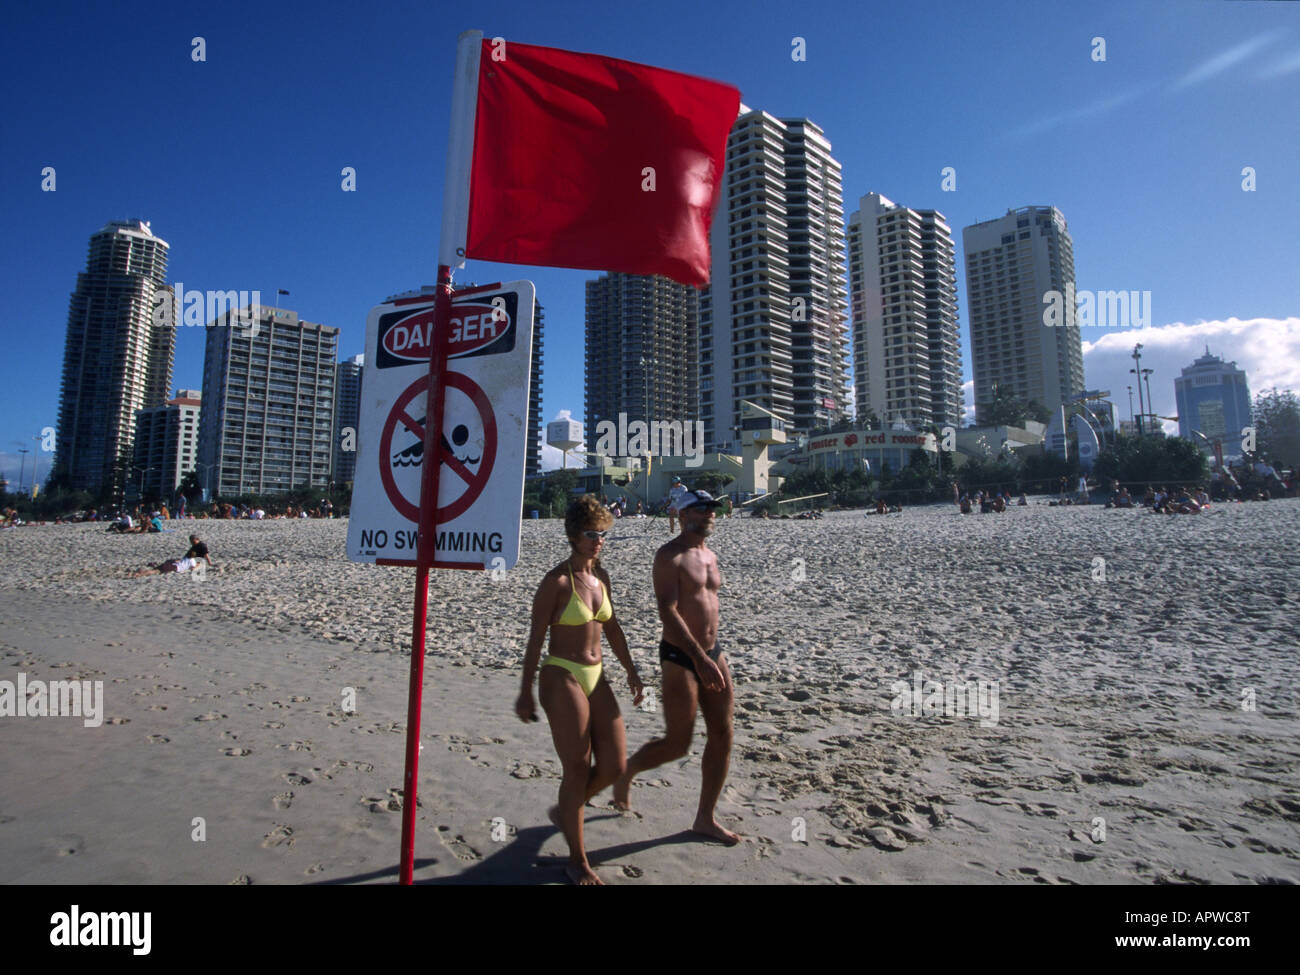 couple on beach surfers paradise - Stock Image